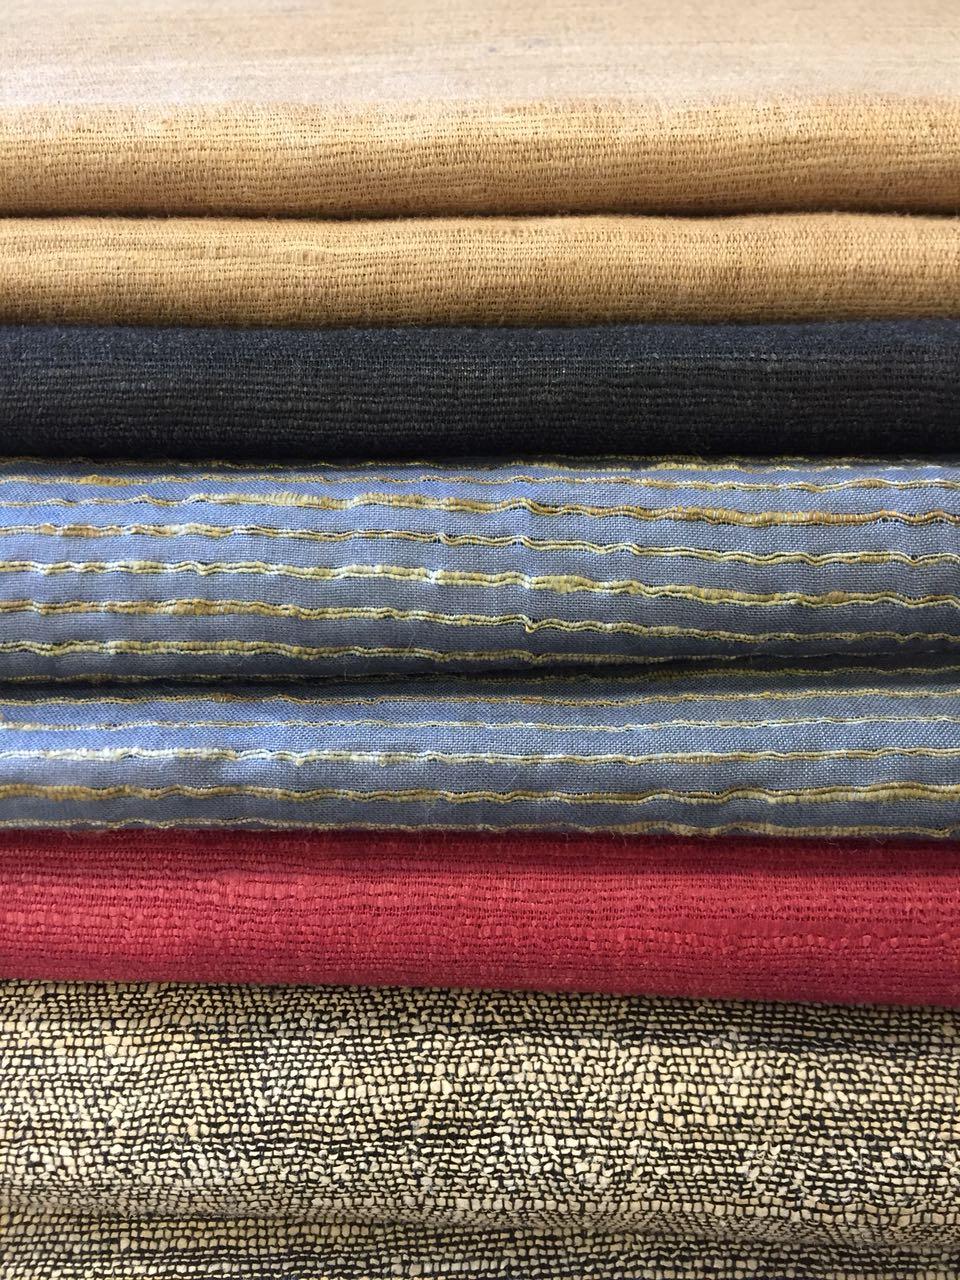 Handwoven Silk Fabrics